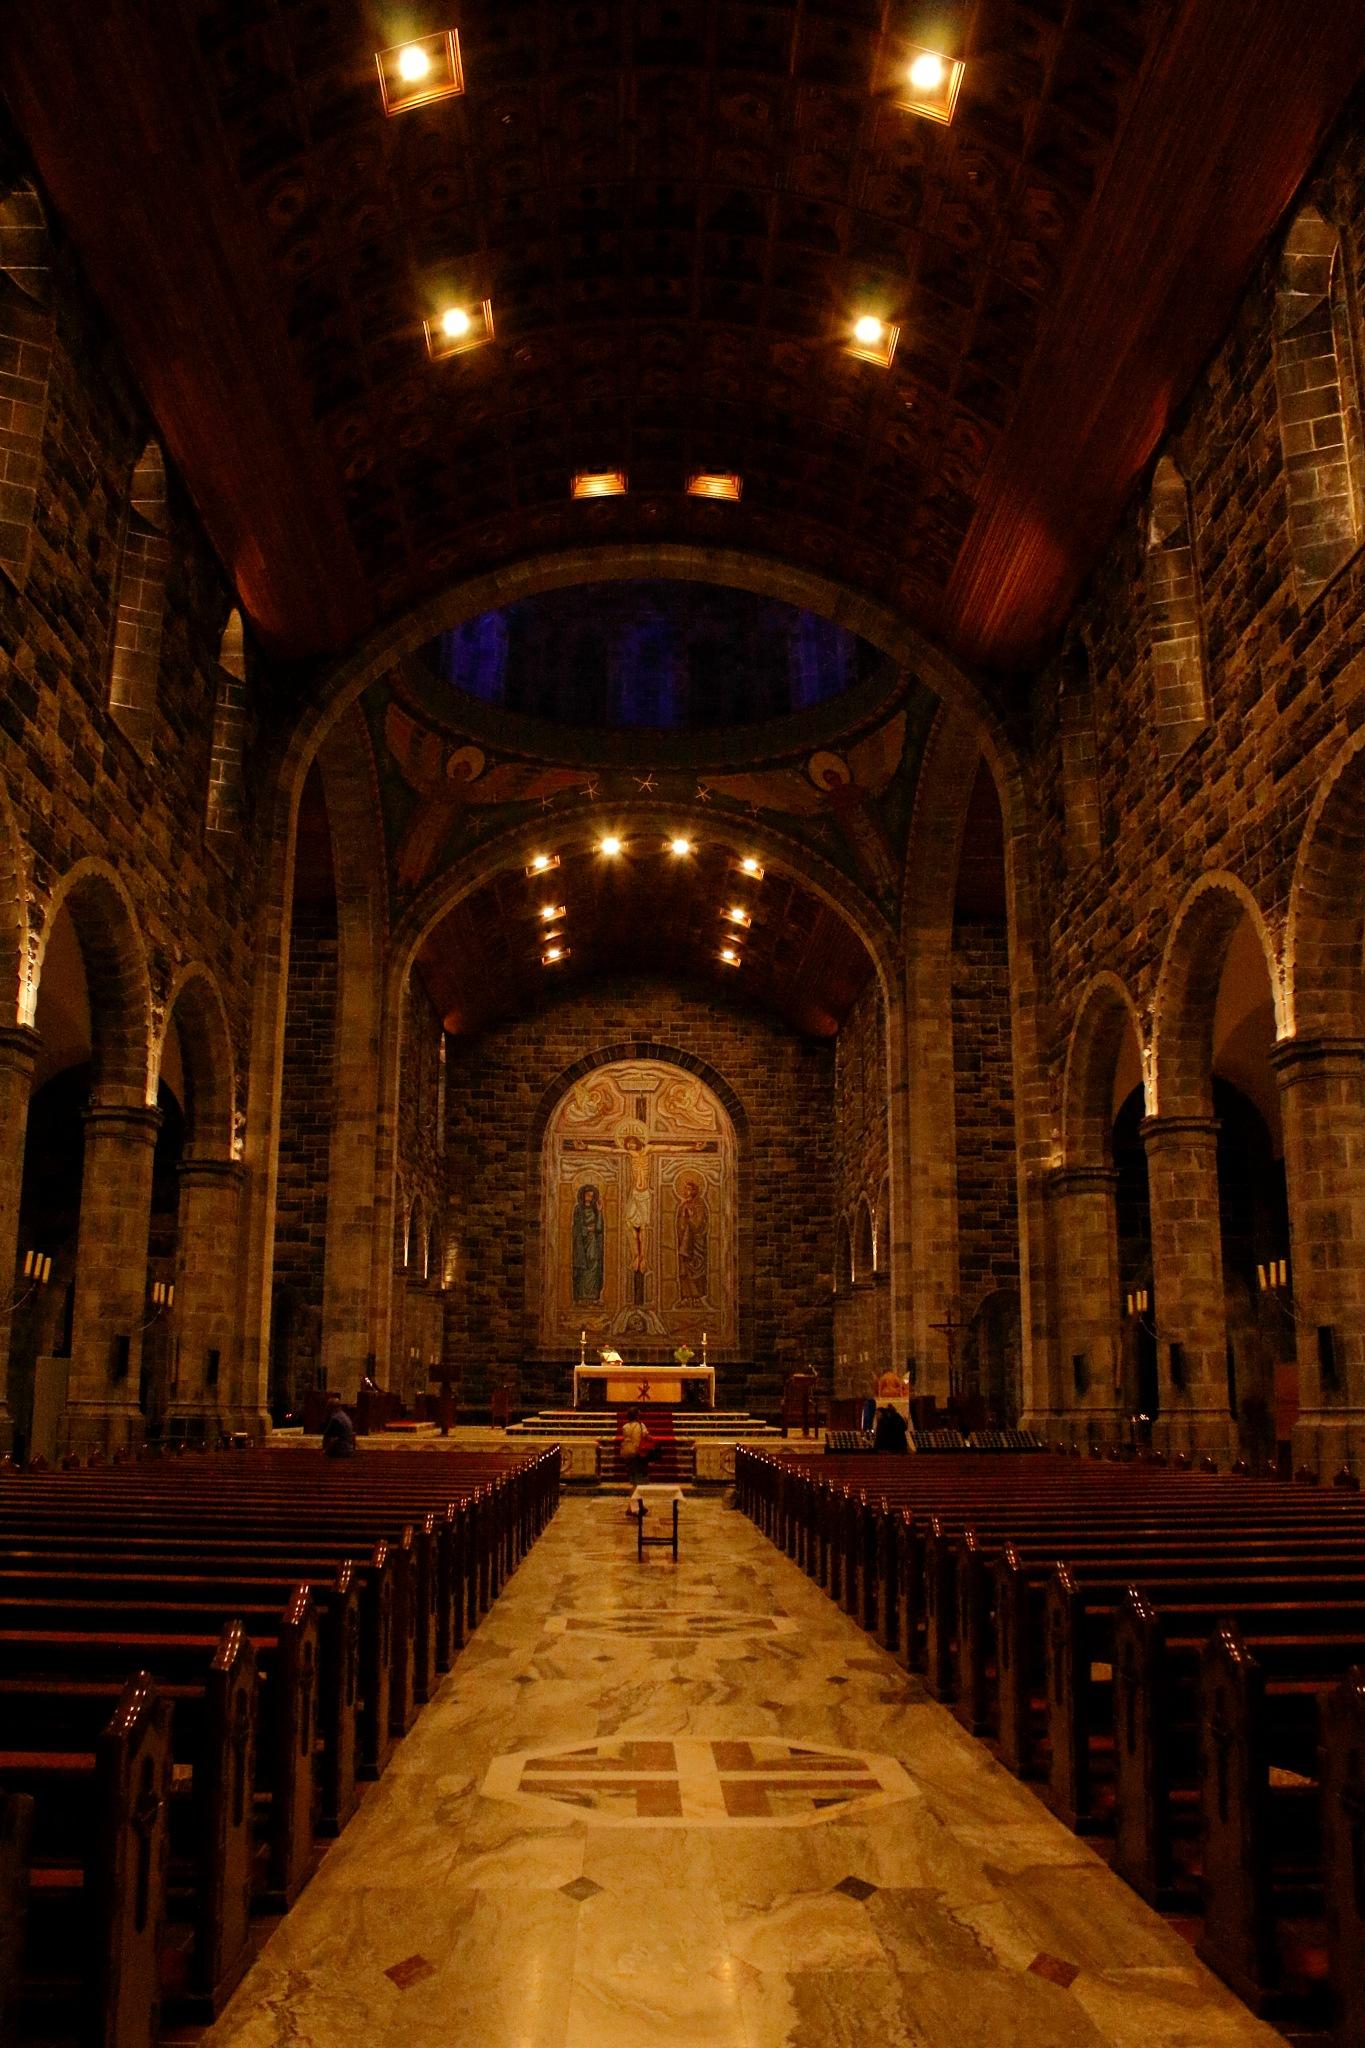 Nun's Cathedral, Galway by shreyaslokanathphotography